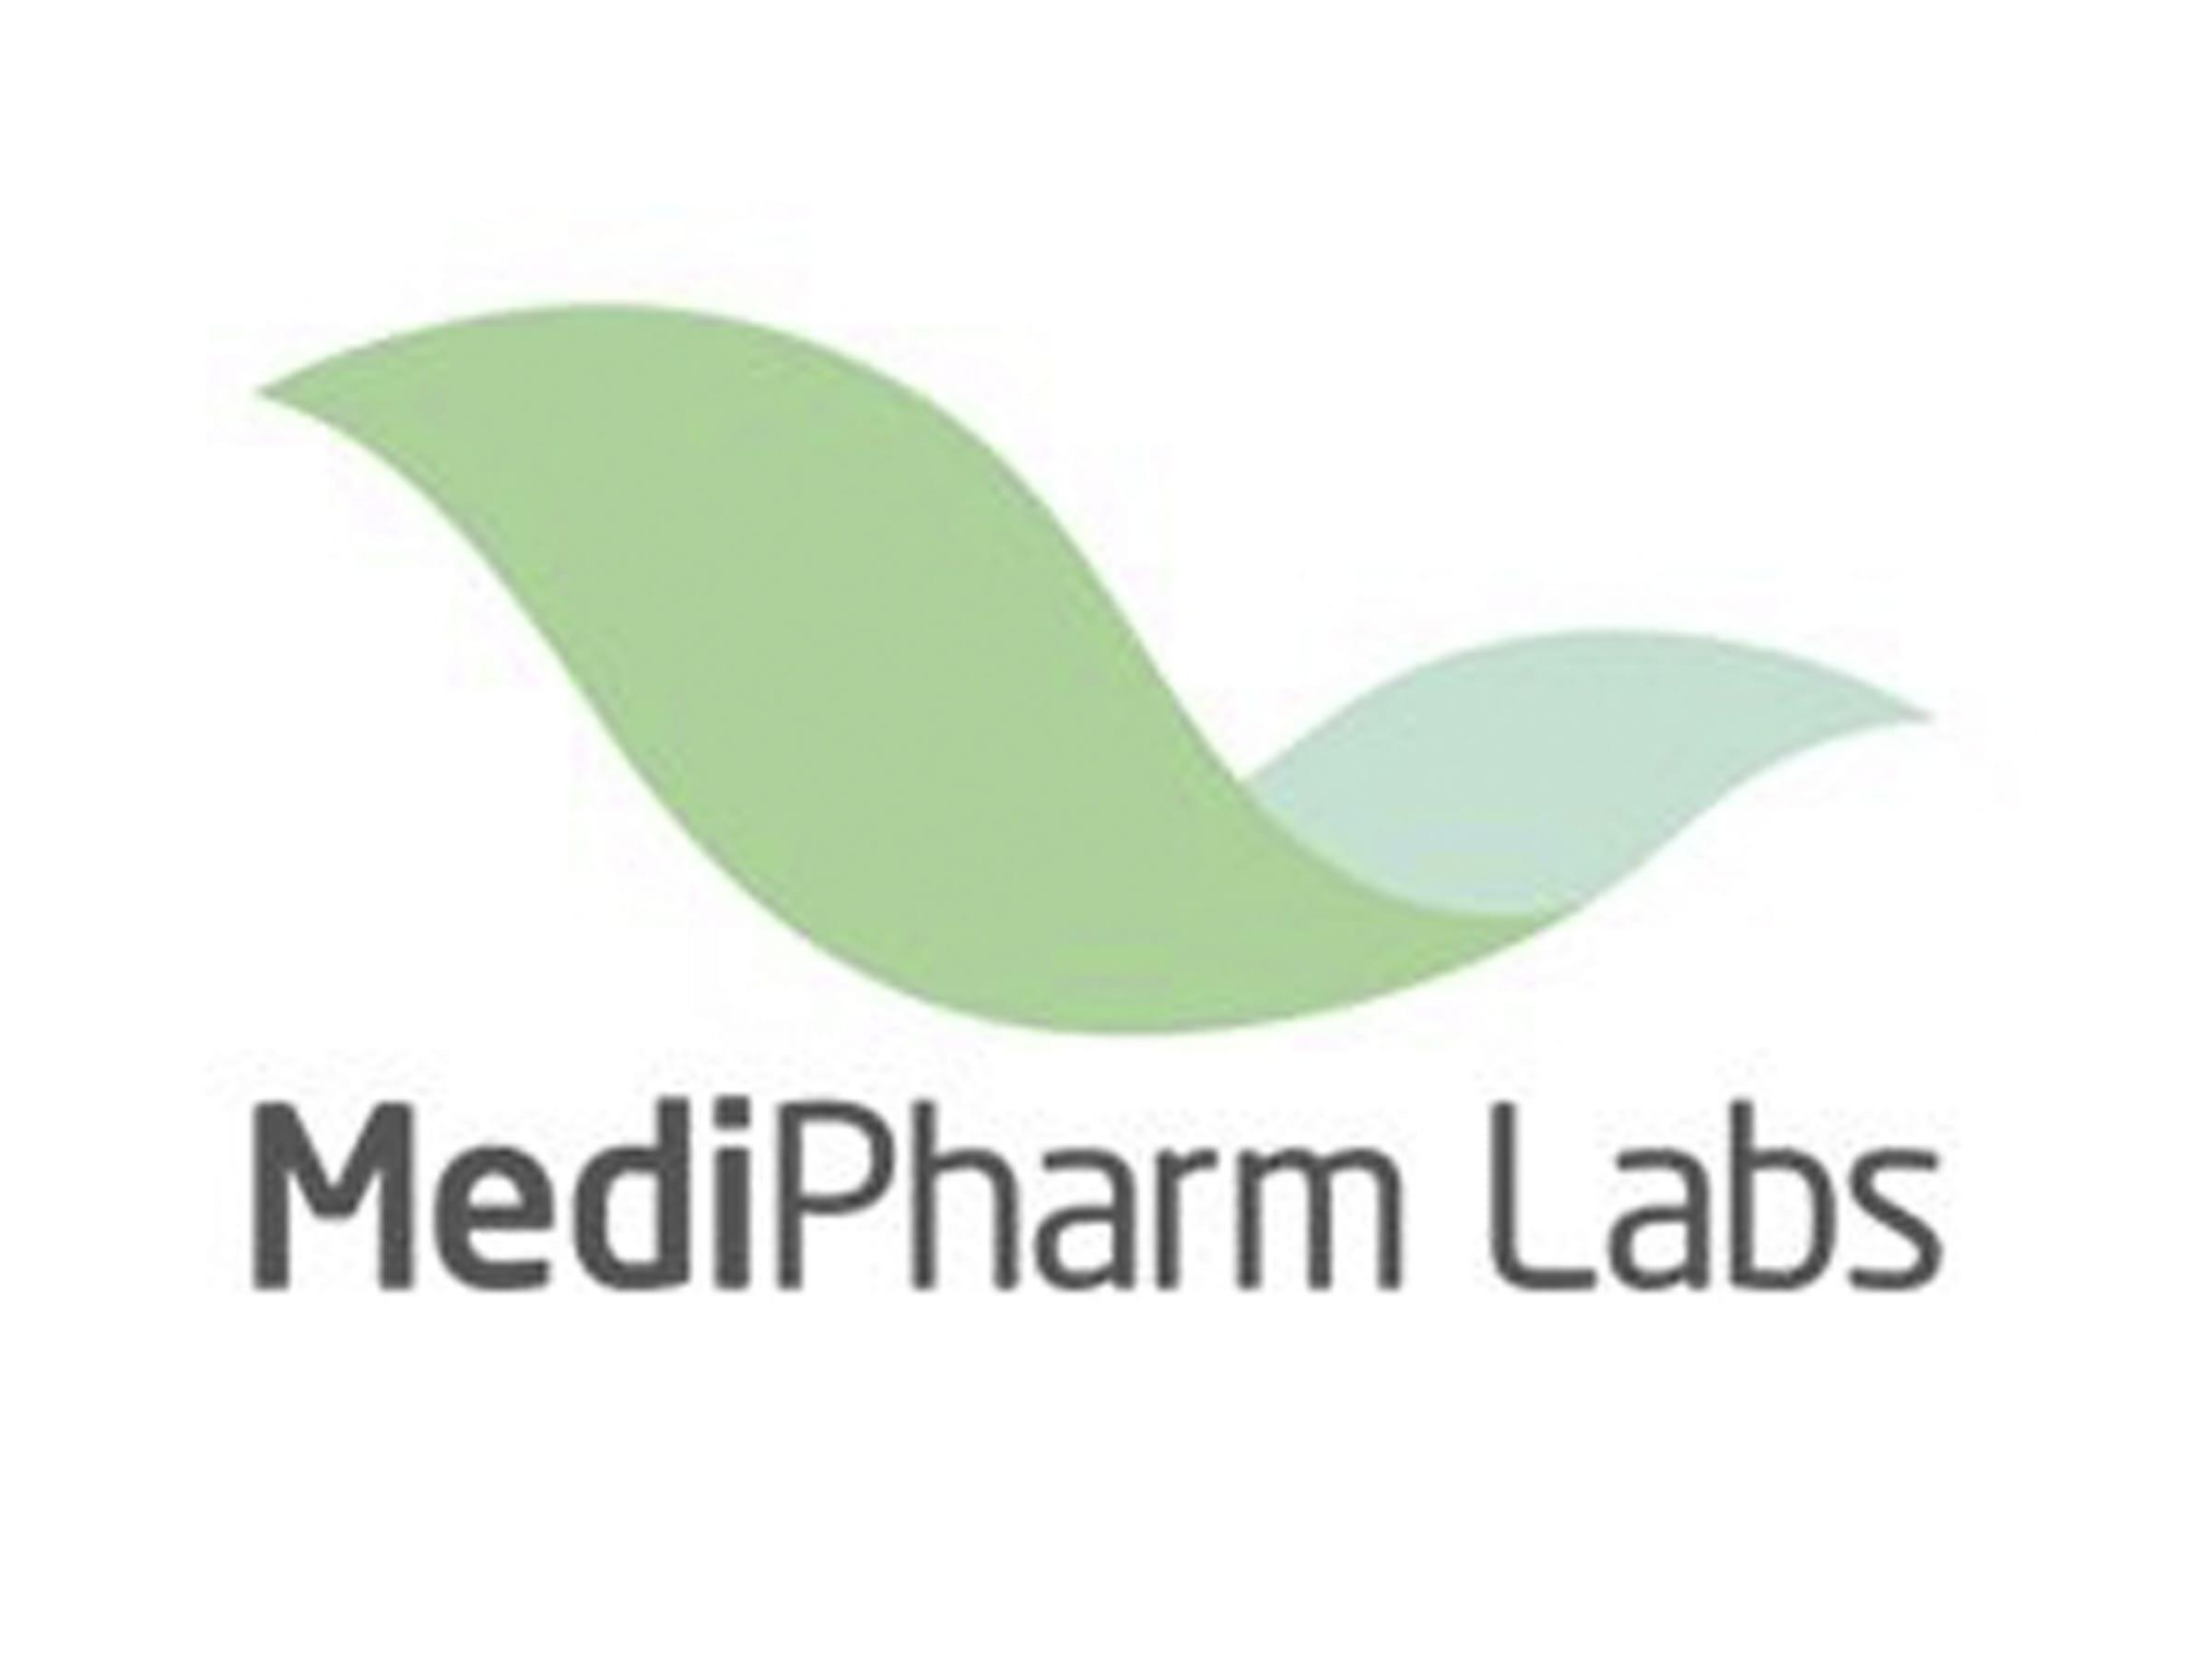 MediPharm Labs Australia Pty Ltd